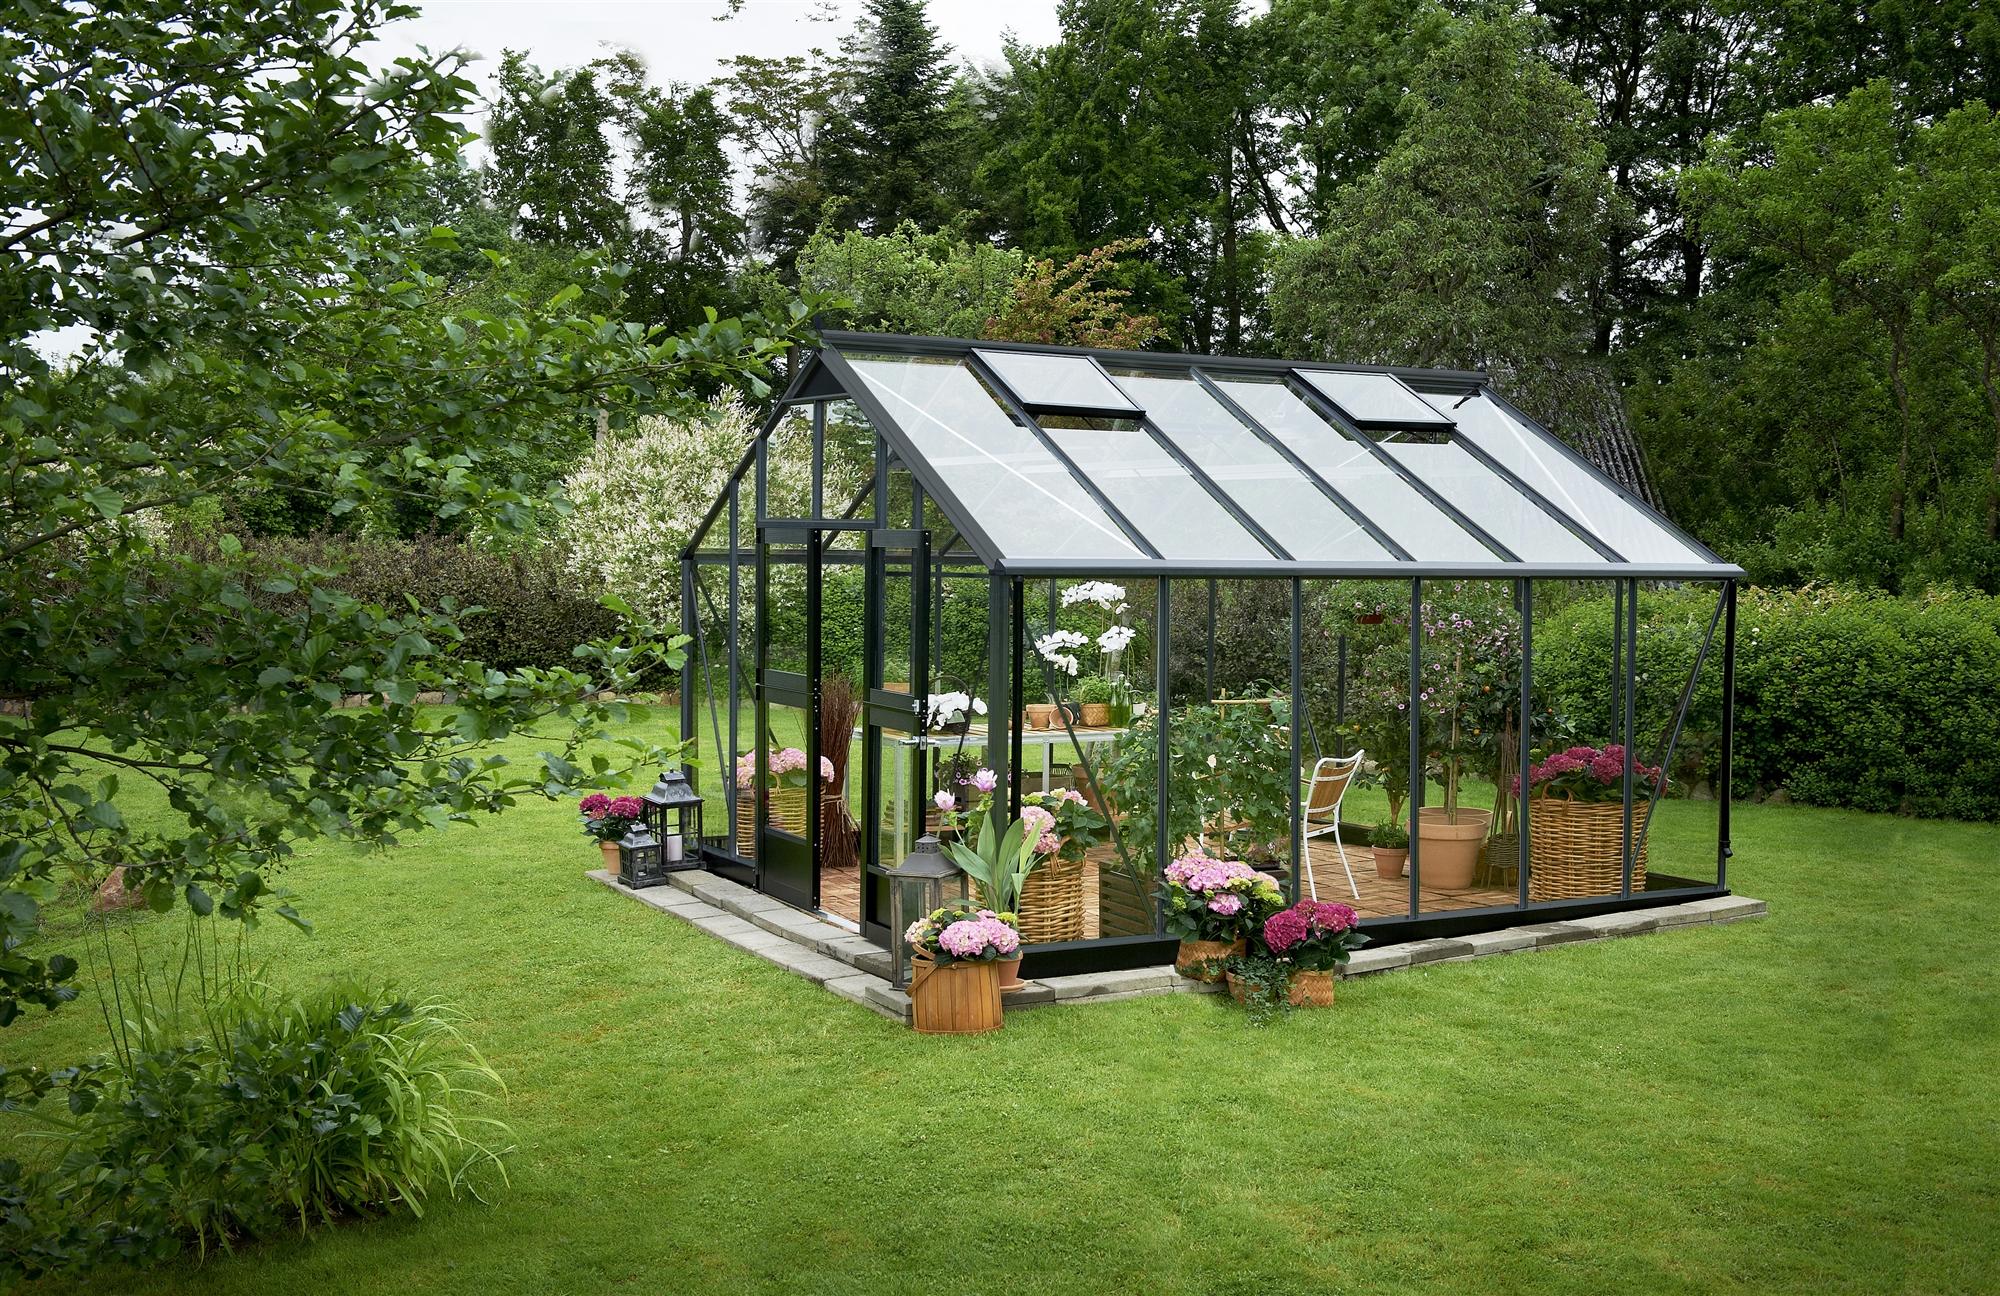 Serre De Jardin Juliana Gartner 16 1m2 Anthracite Verre Horticole